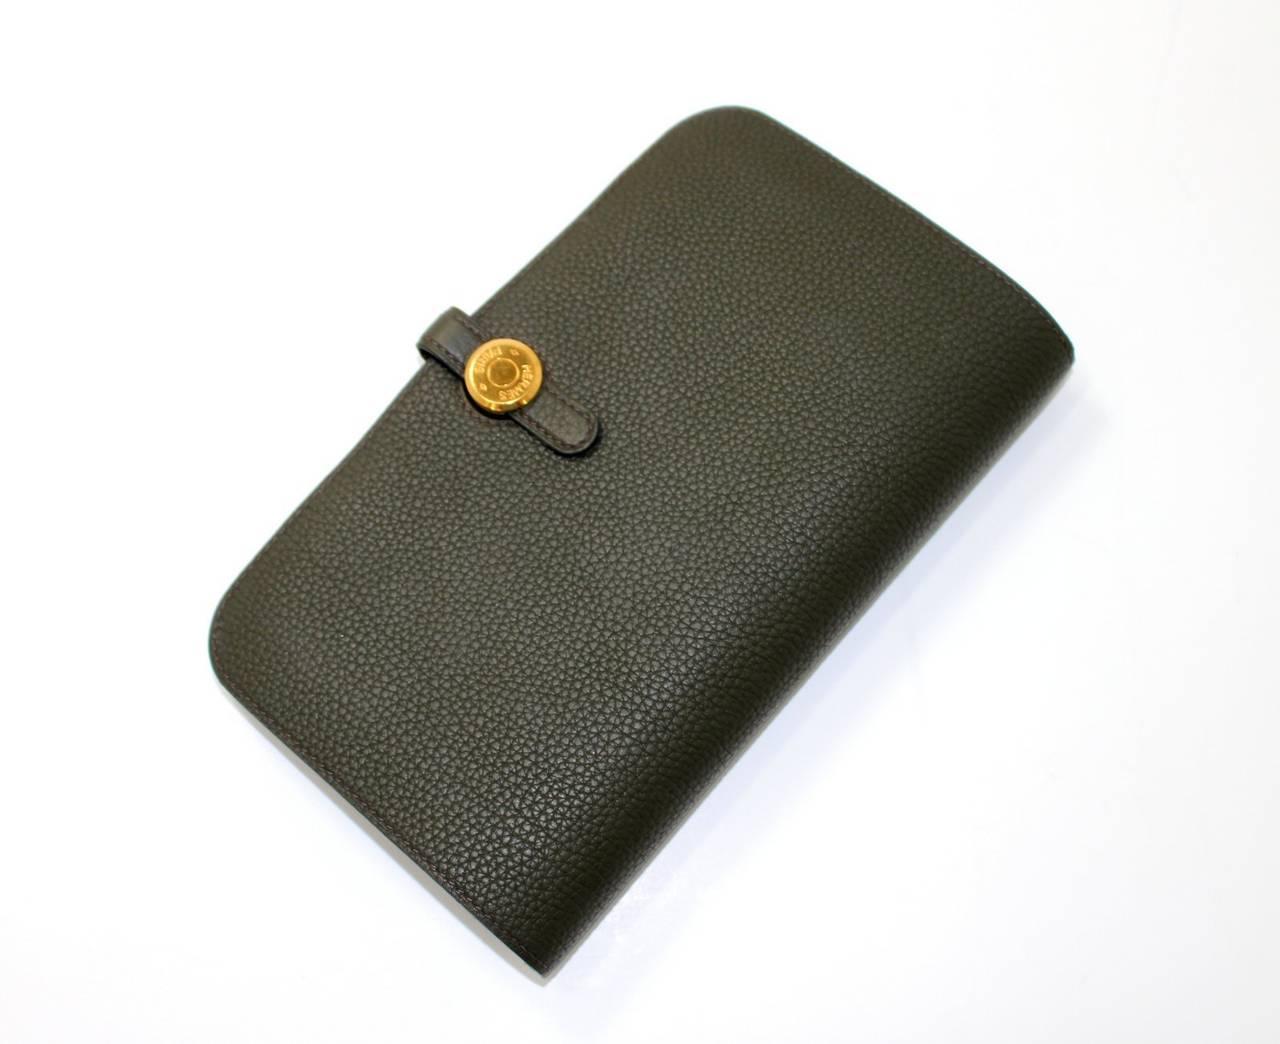 sac birkin hermes imitation - hermes orange togo dogon duo wallet phw, hermes wallet for men